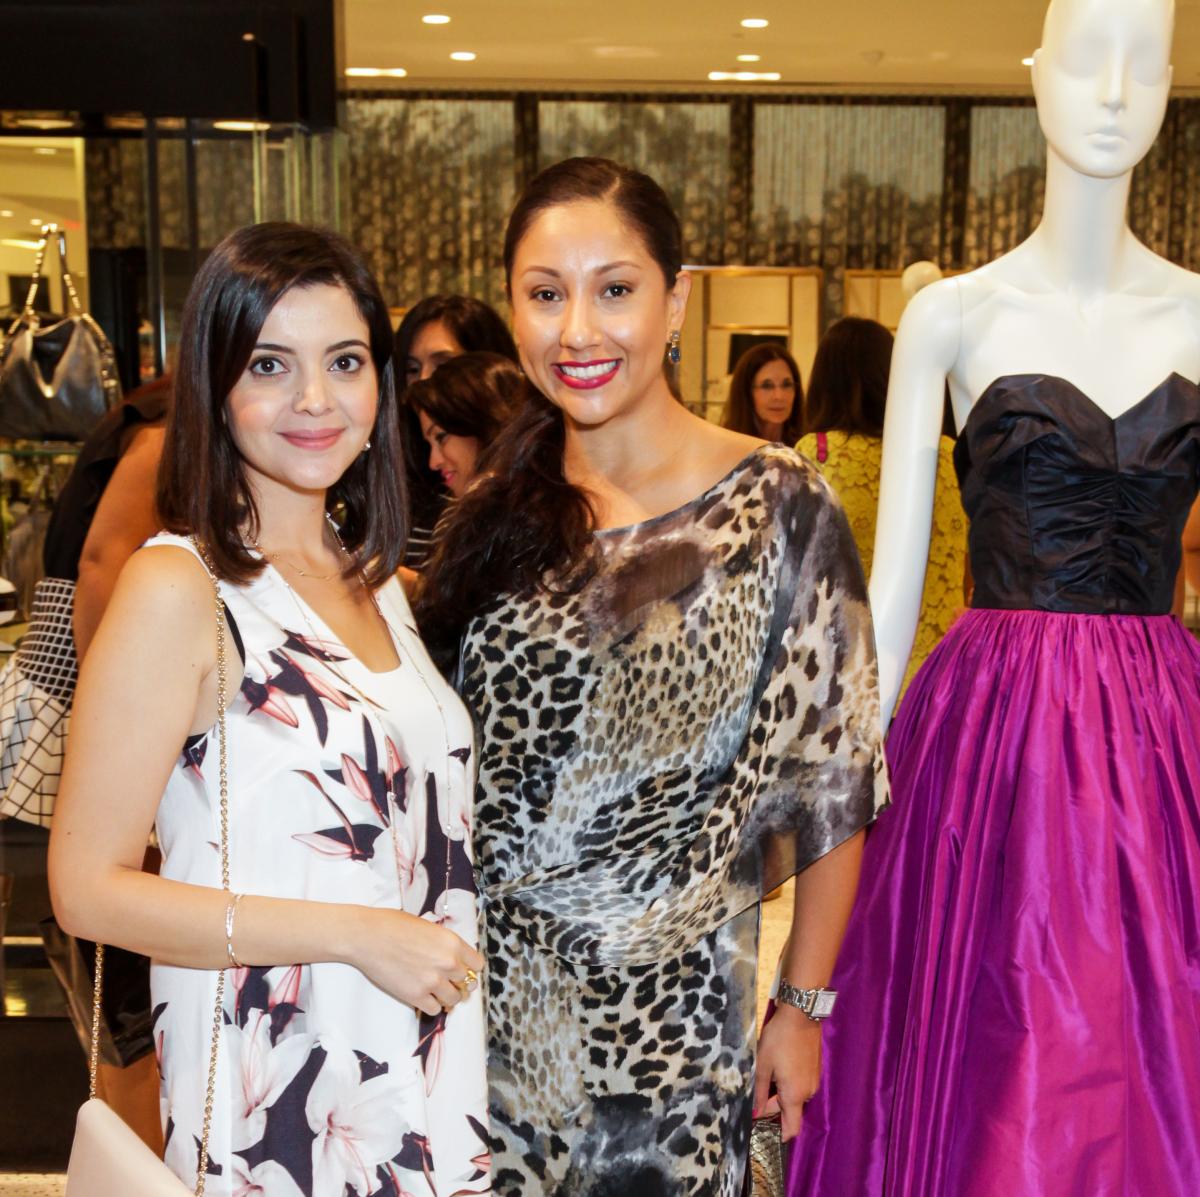 Houston, Ellevate event at Tootsies, August 2015, Layla Asgari, Nancy Almodovar